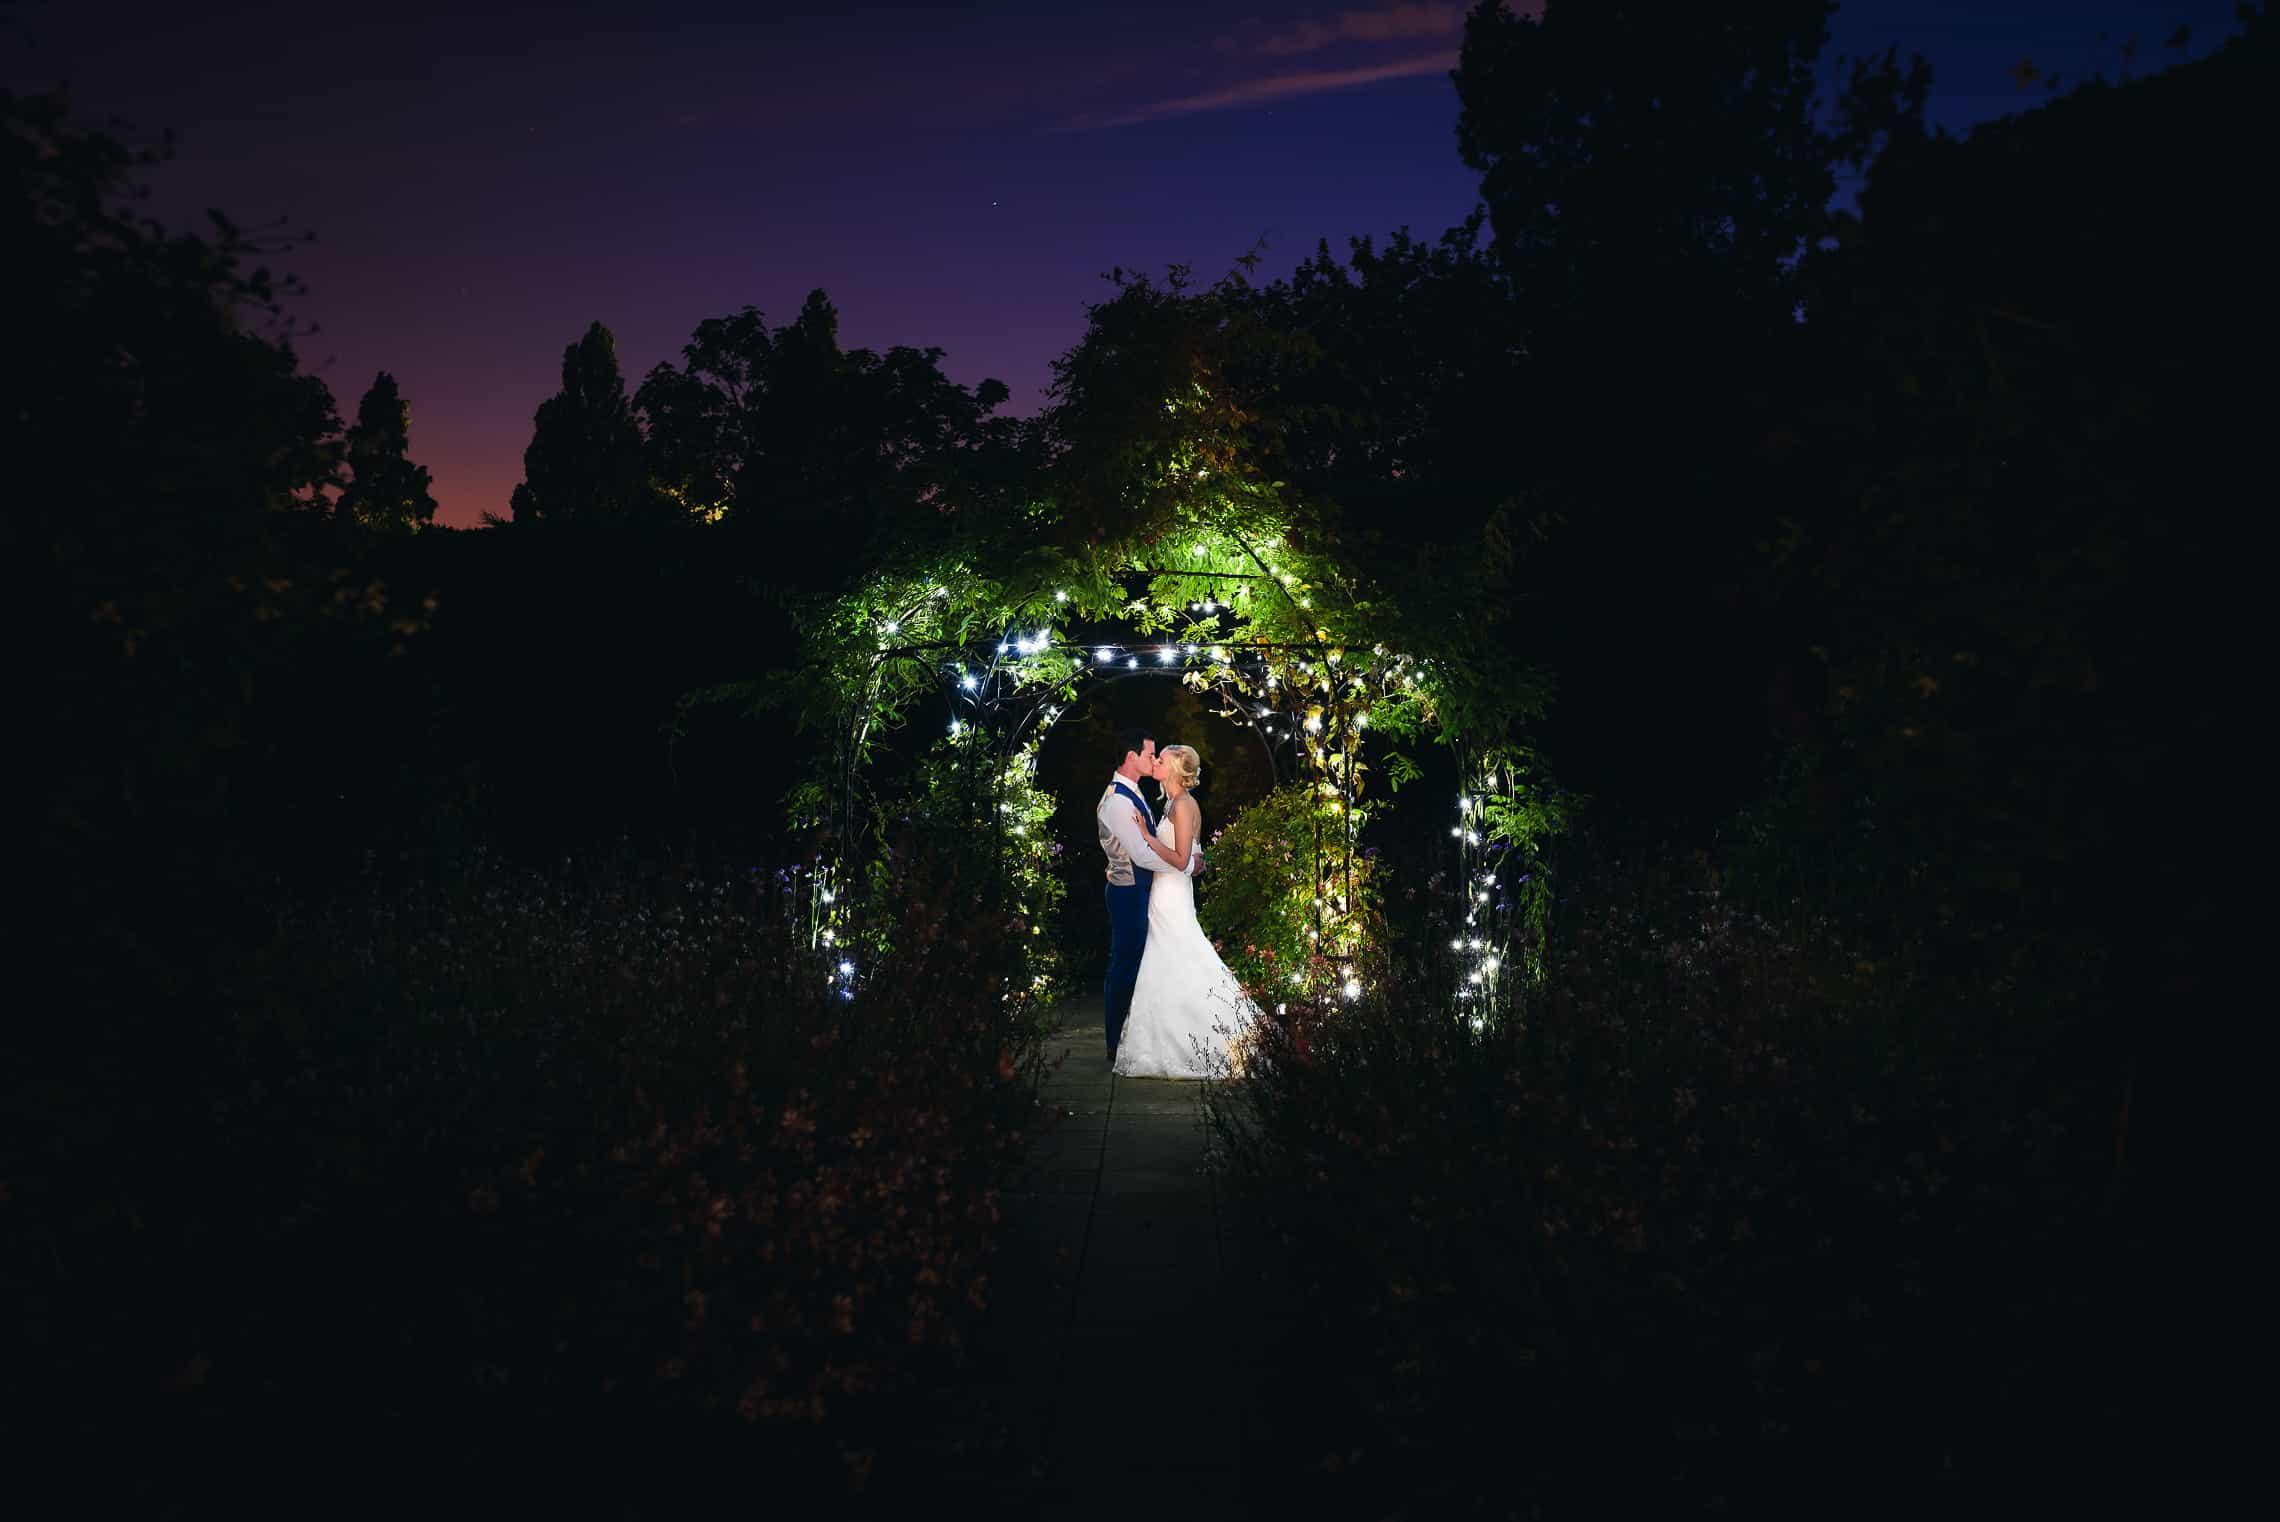 gaynes_park_wedding_lm_justin_bailey_photography_020